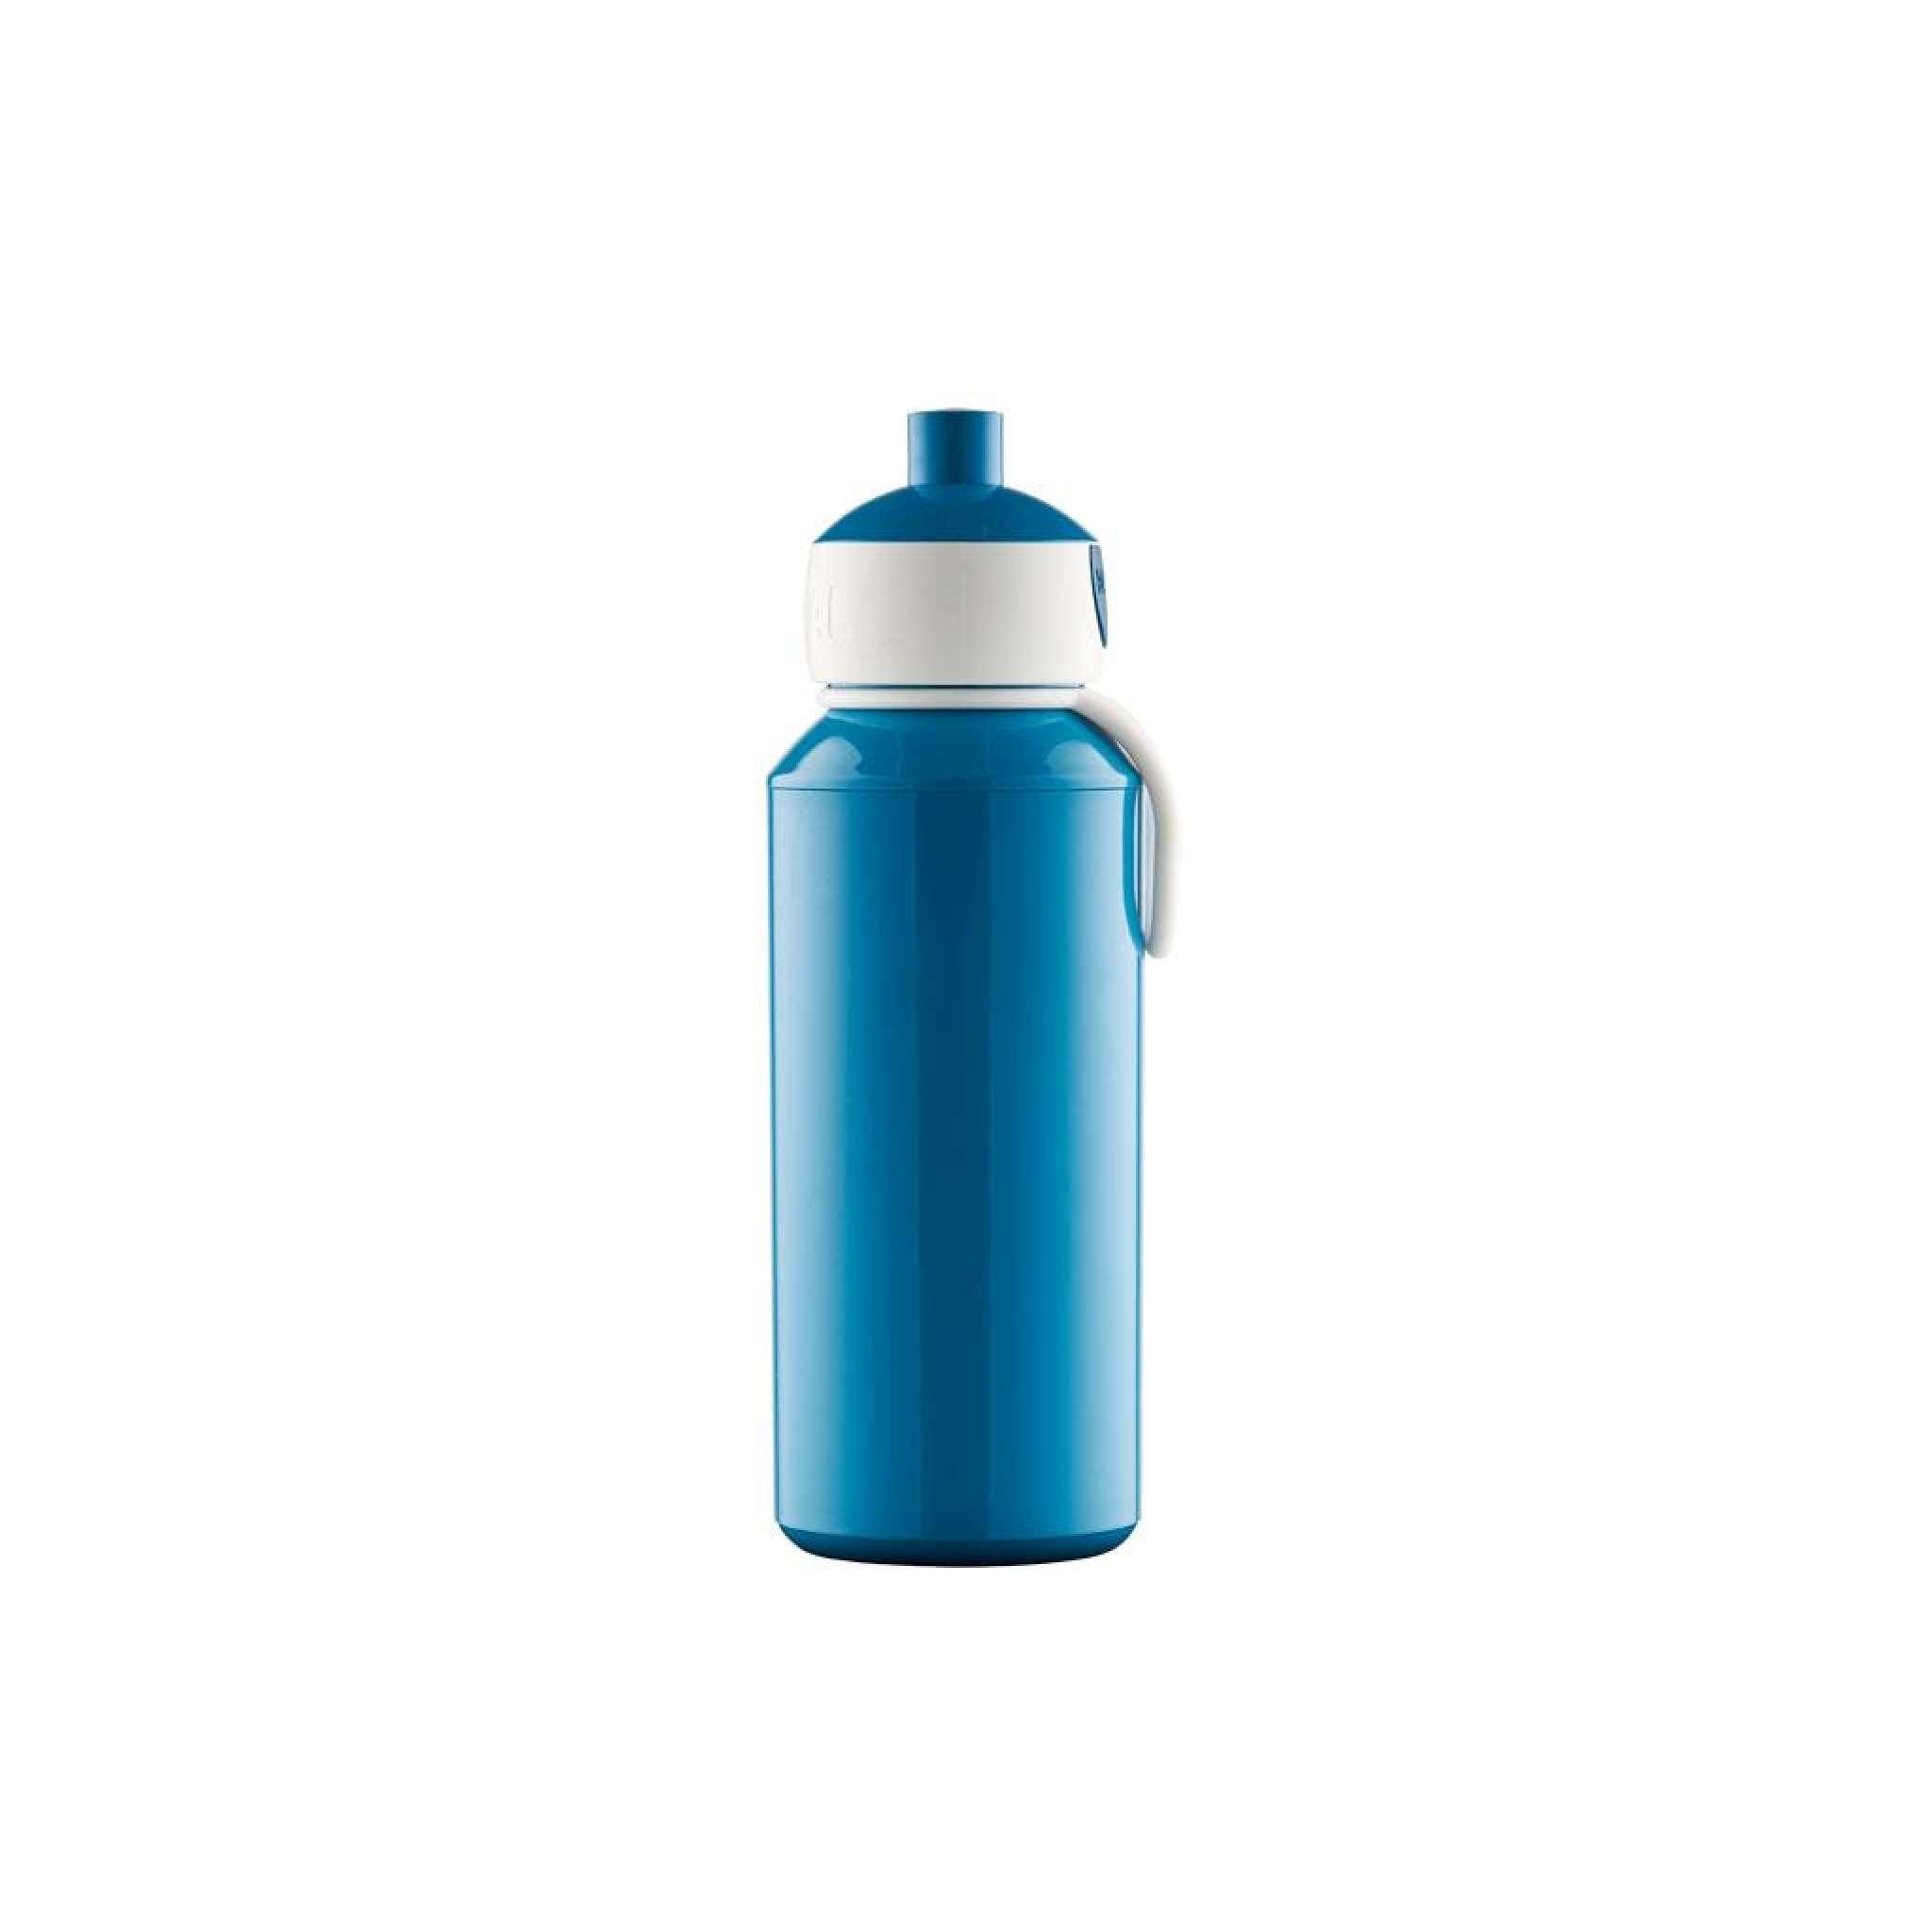 Mepal Drikkeflaske 400 ml blå